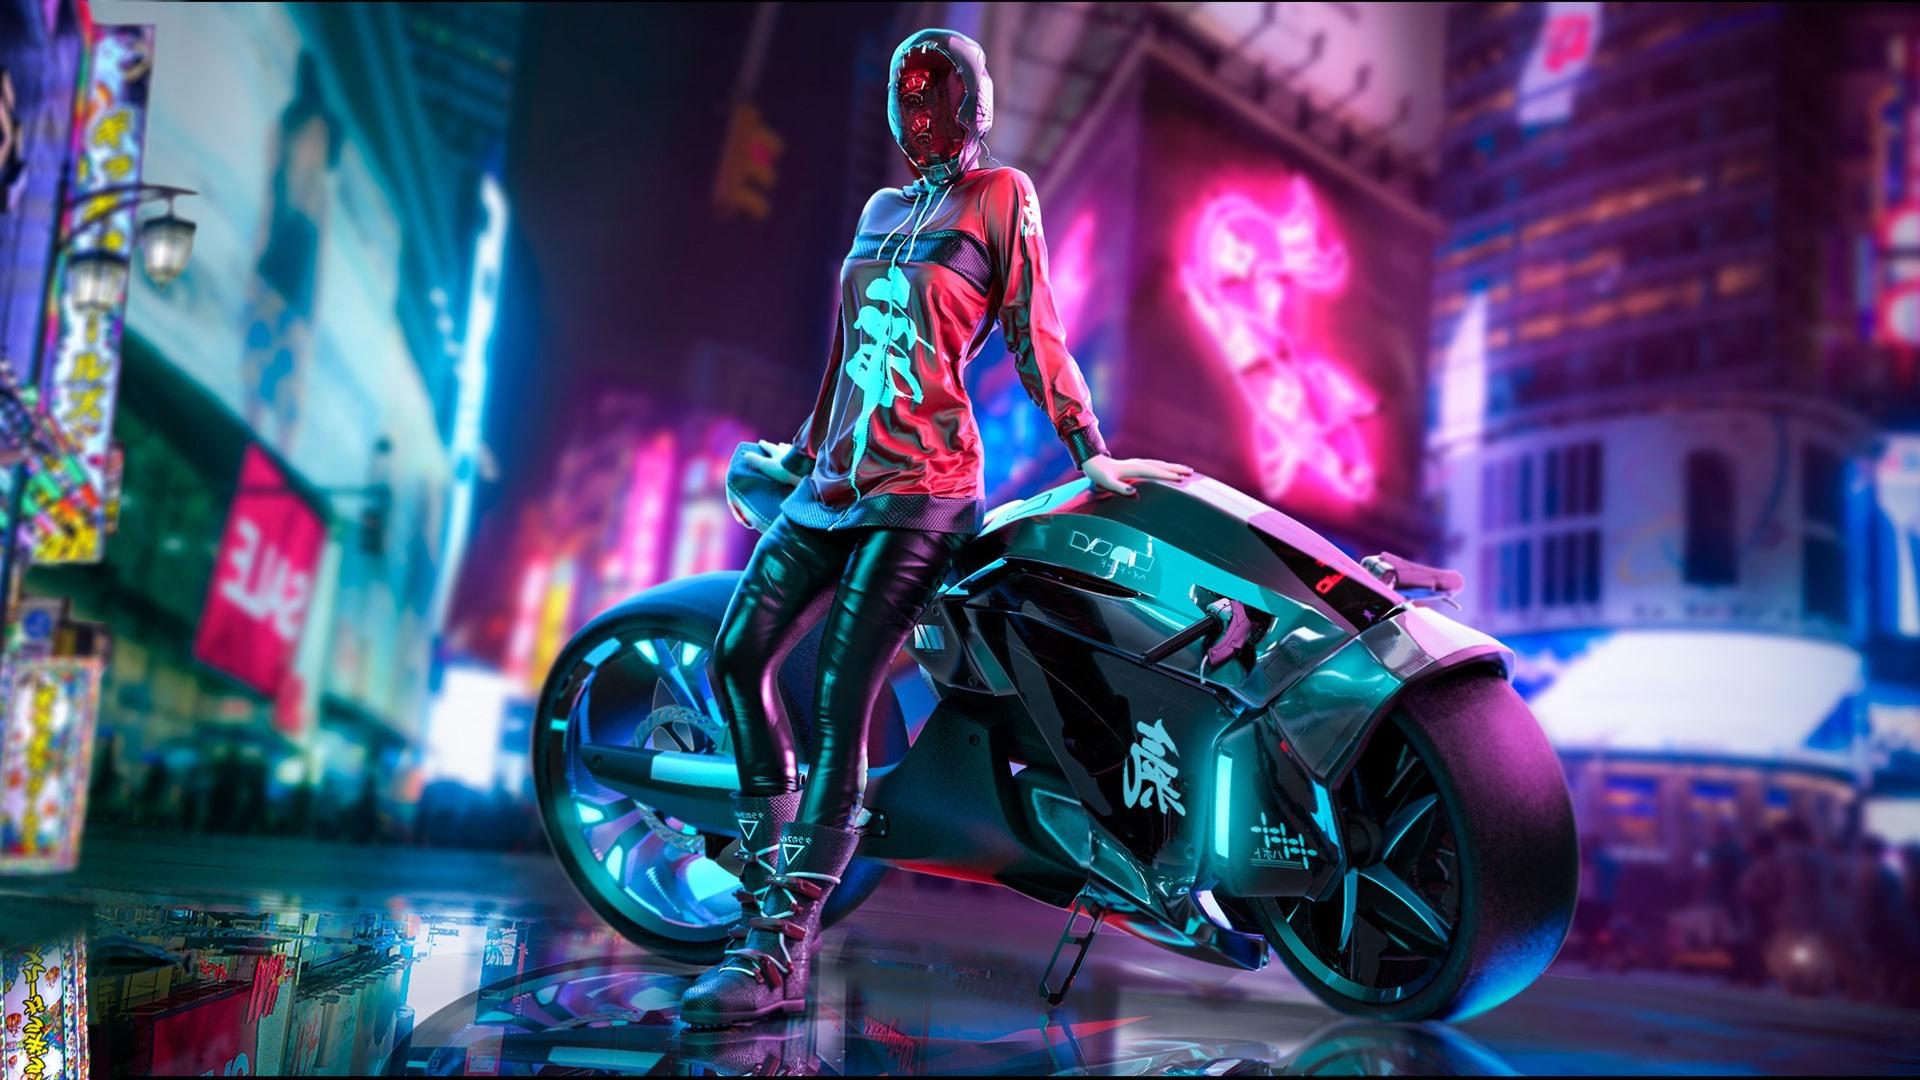 Wallpaper Cyberpunk 2077 City Girl Motorcycle 1920x1080